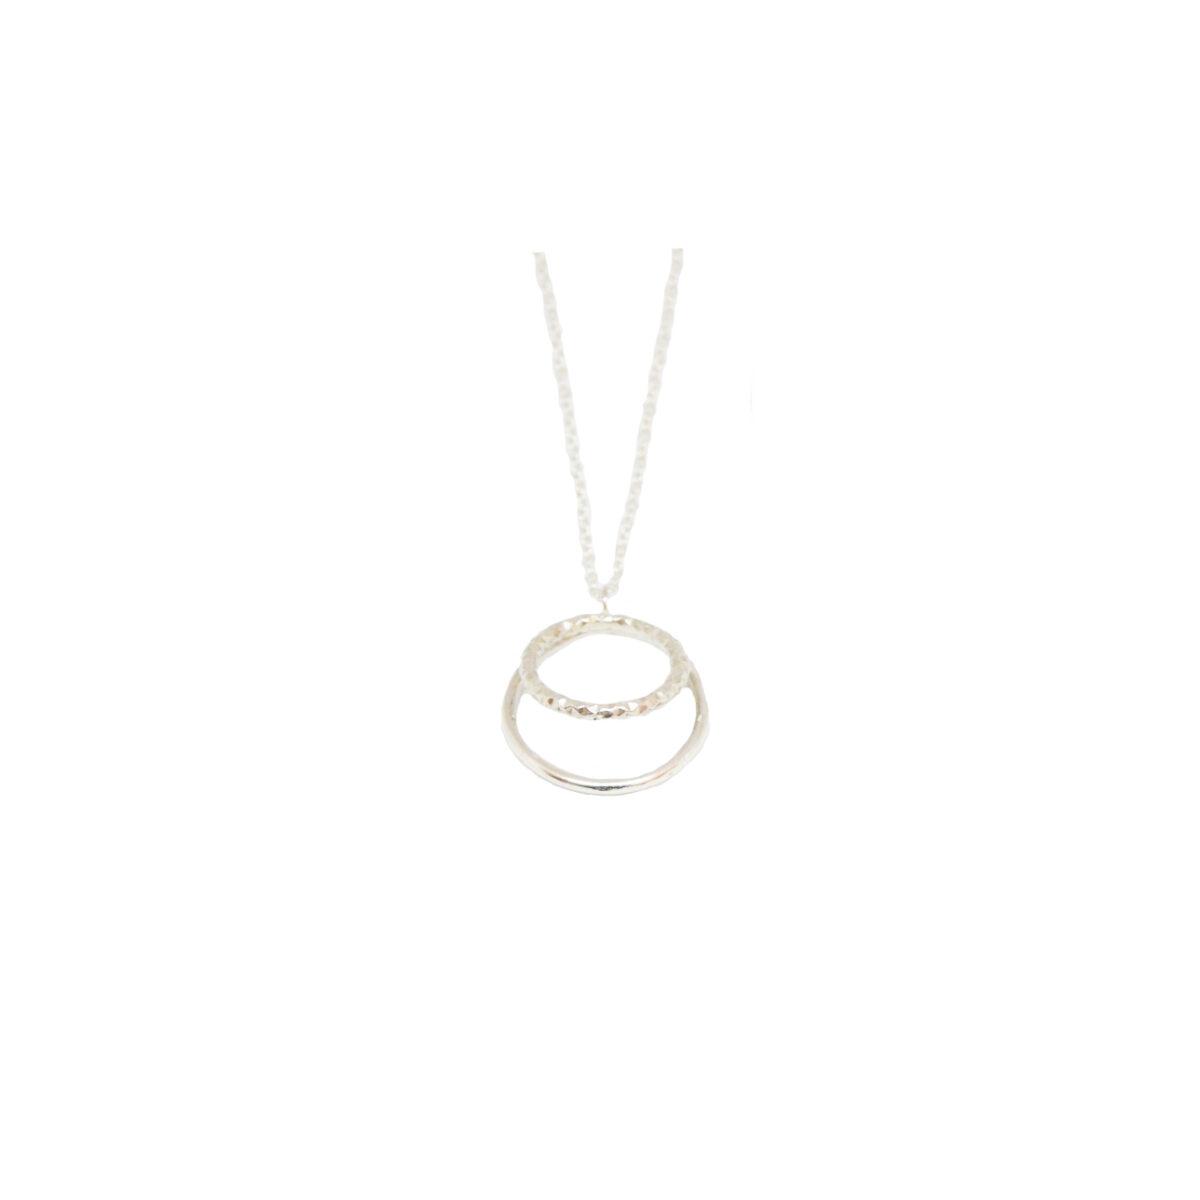 Duo necklace II silver